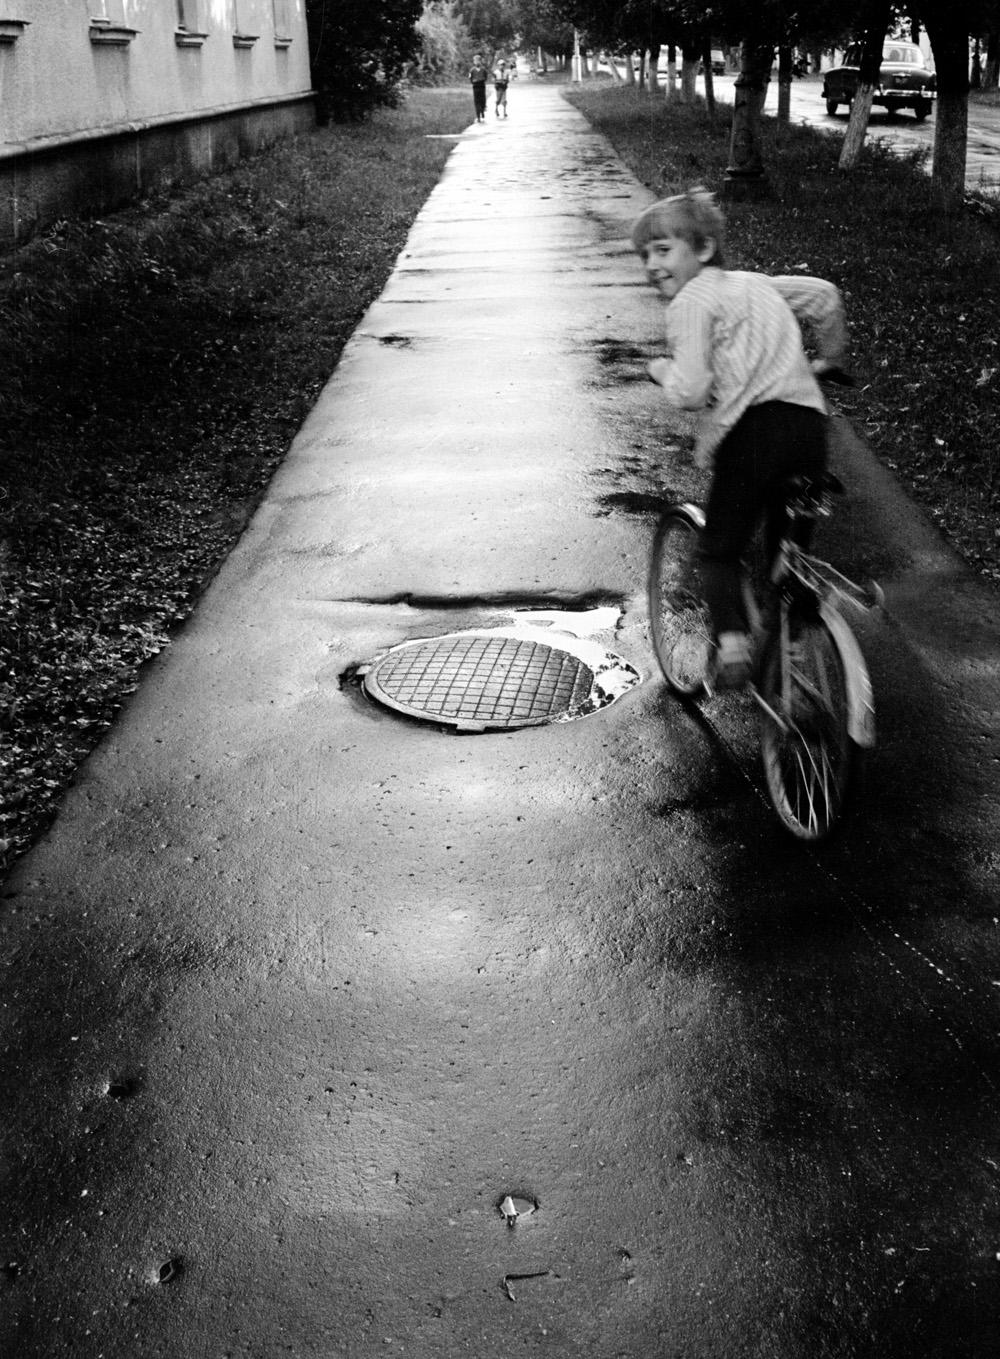 Bicyicle street riding after the rain (Pic: Roman Yarovitcin)